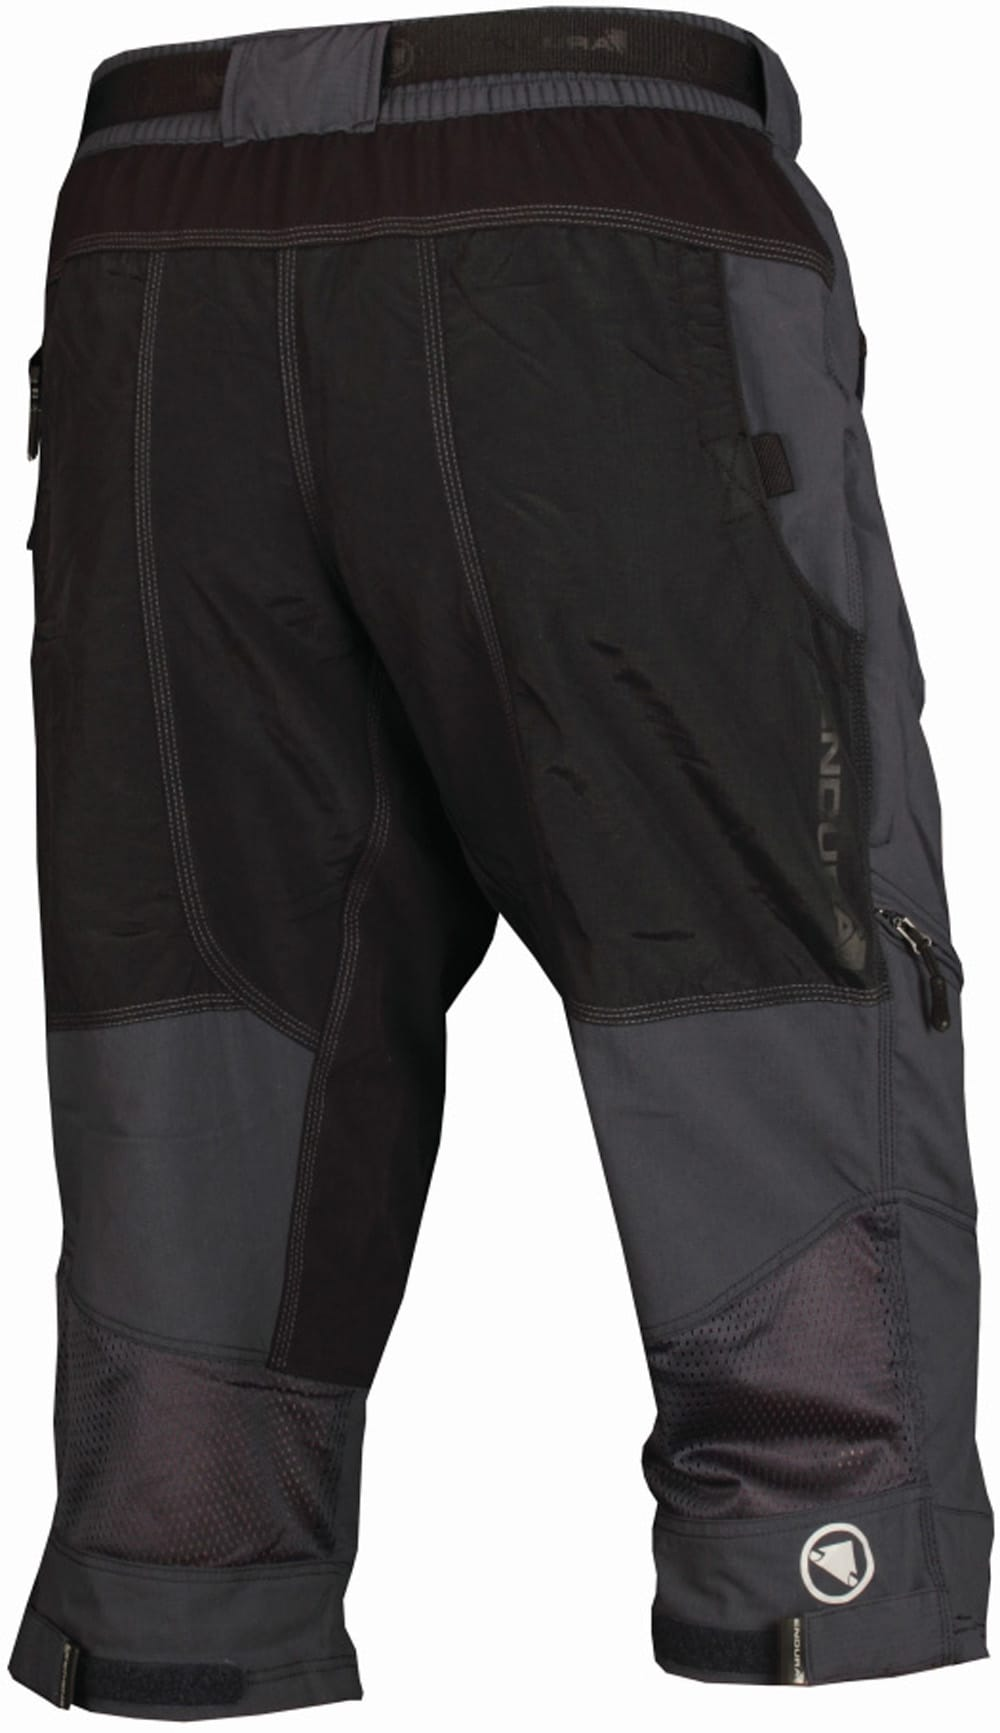 Endura Hummvee 3 4 Baggy Shorts All Terrain Cycles